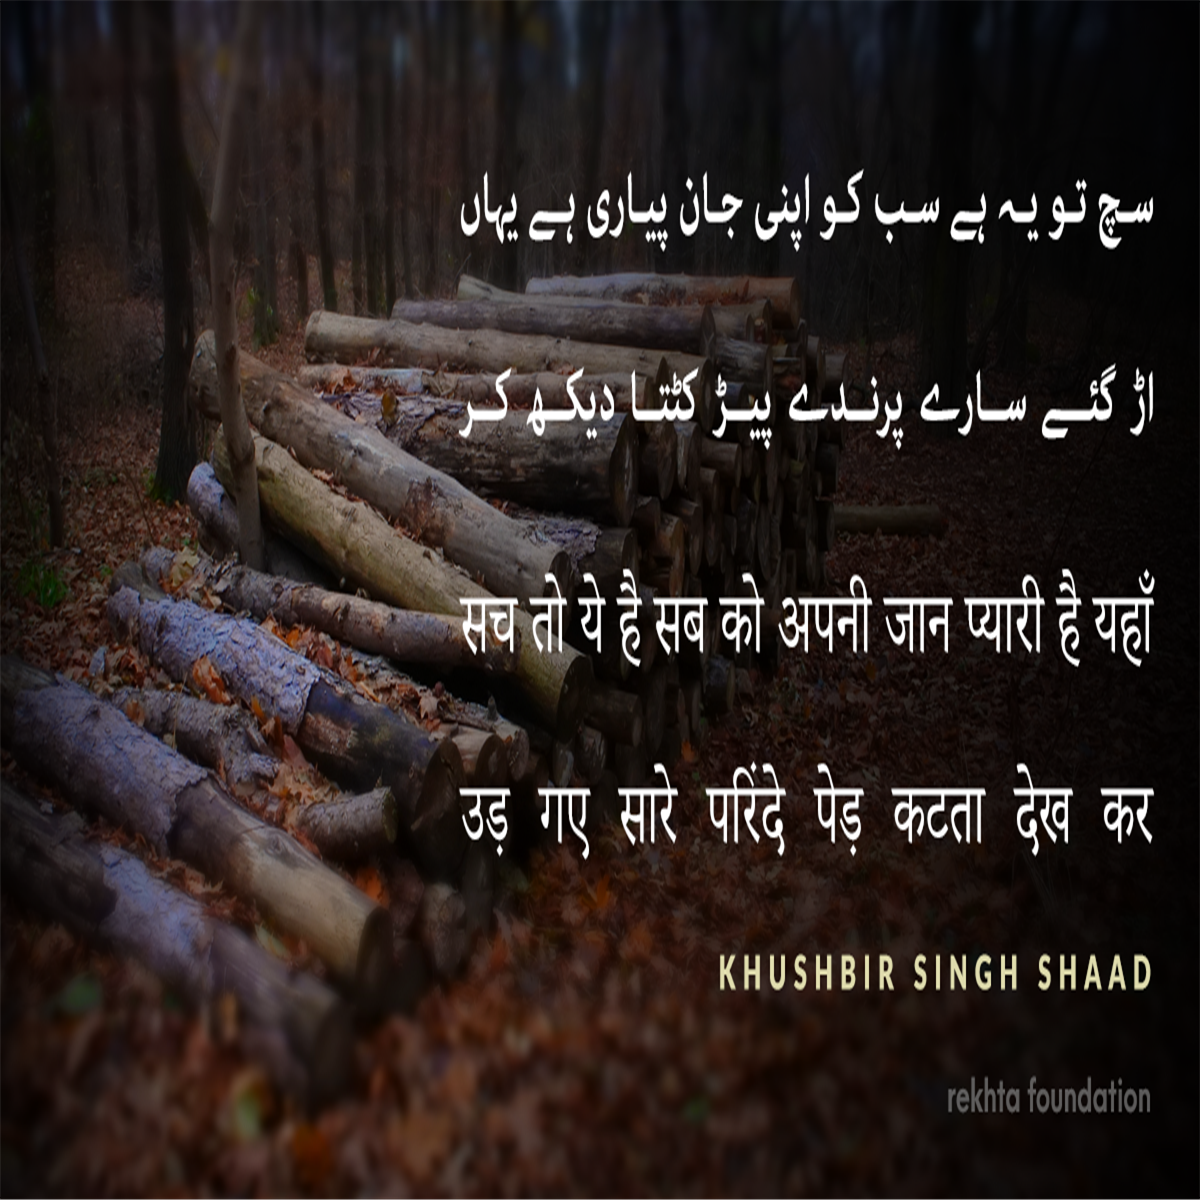 Khushbir Singh Shaad